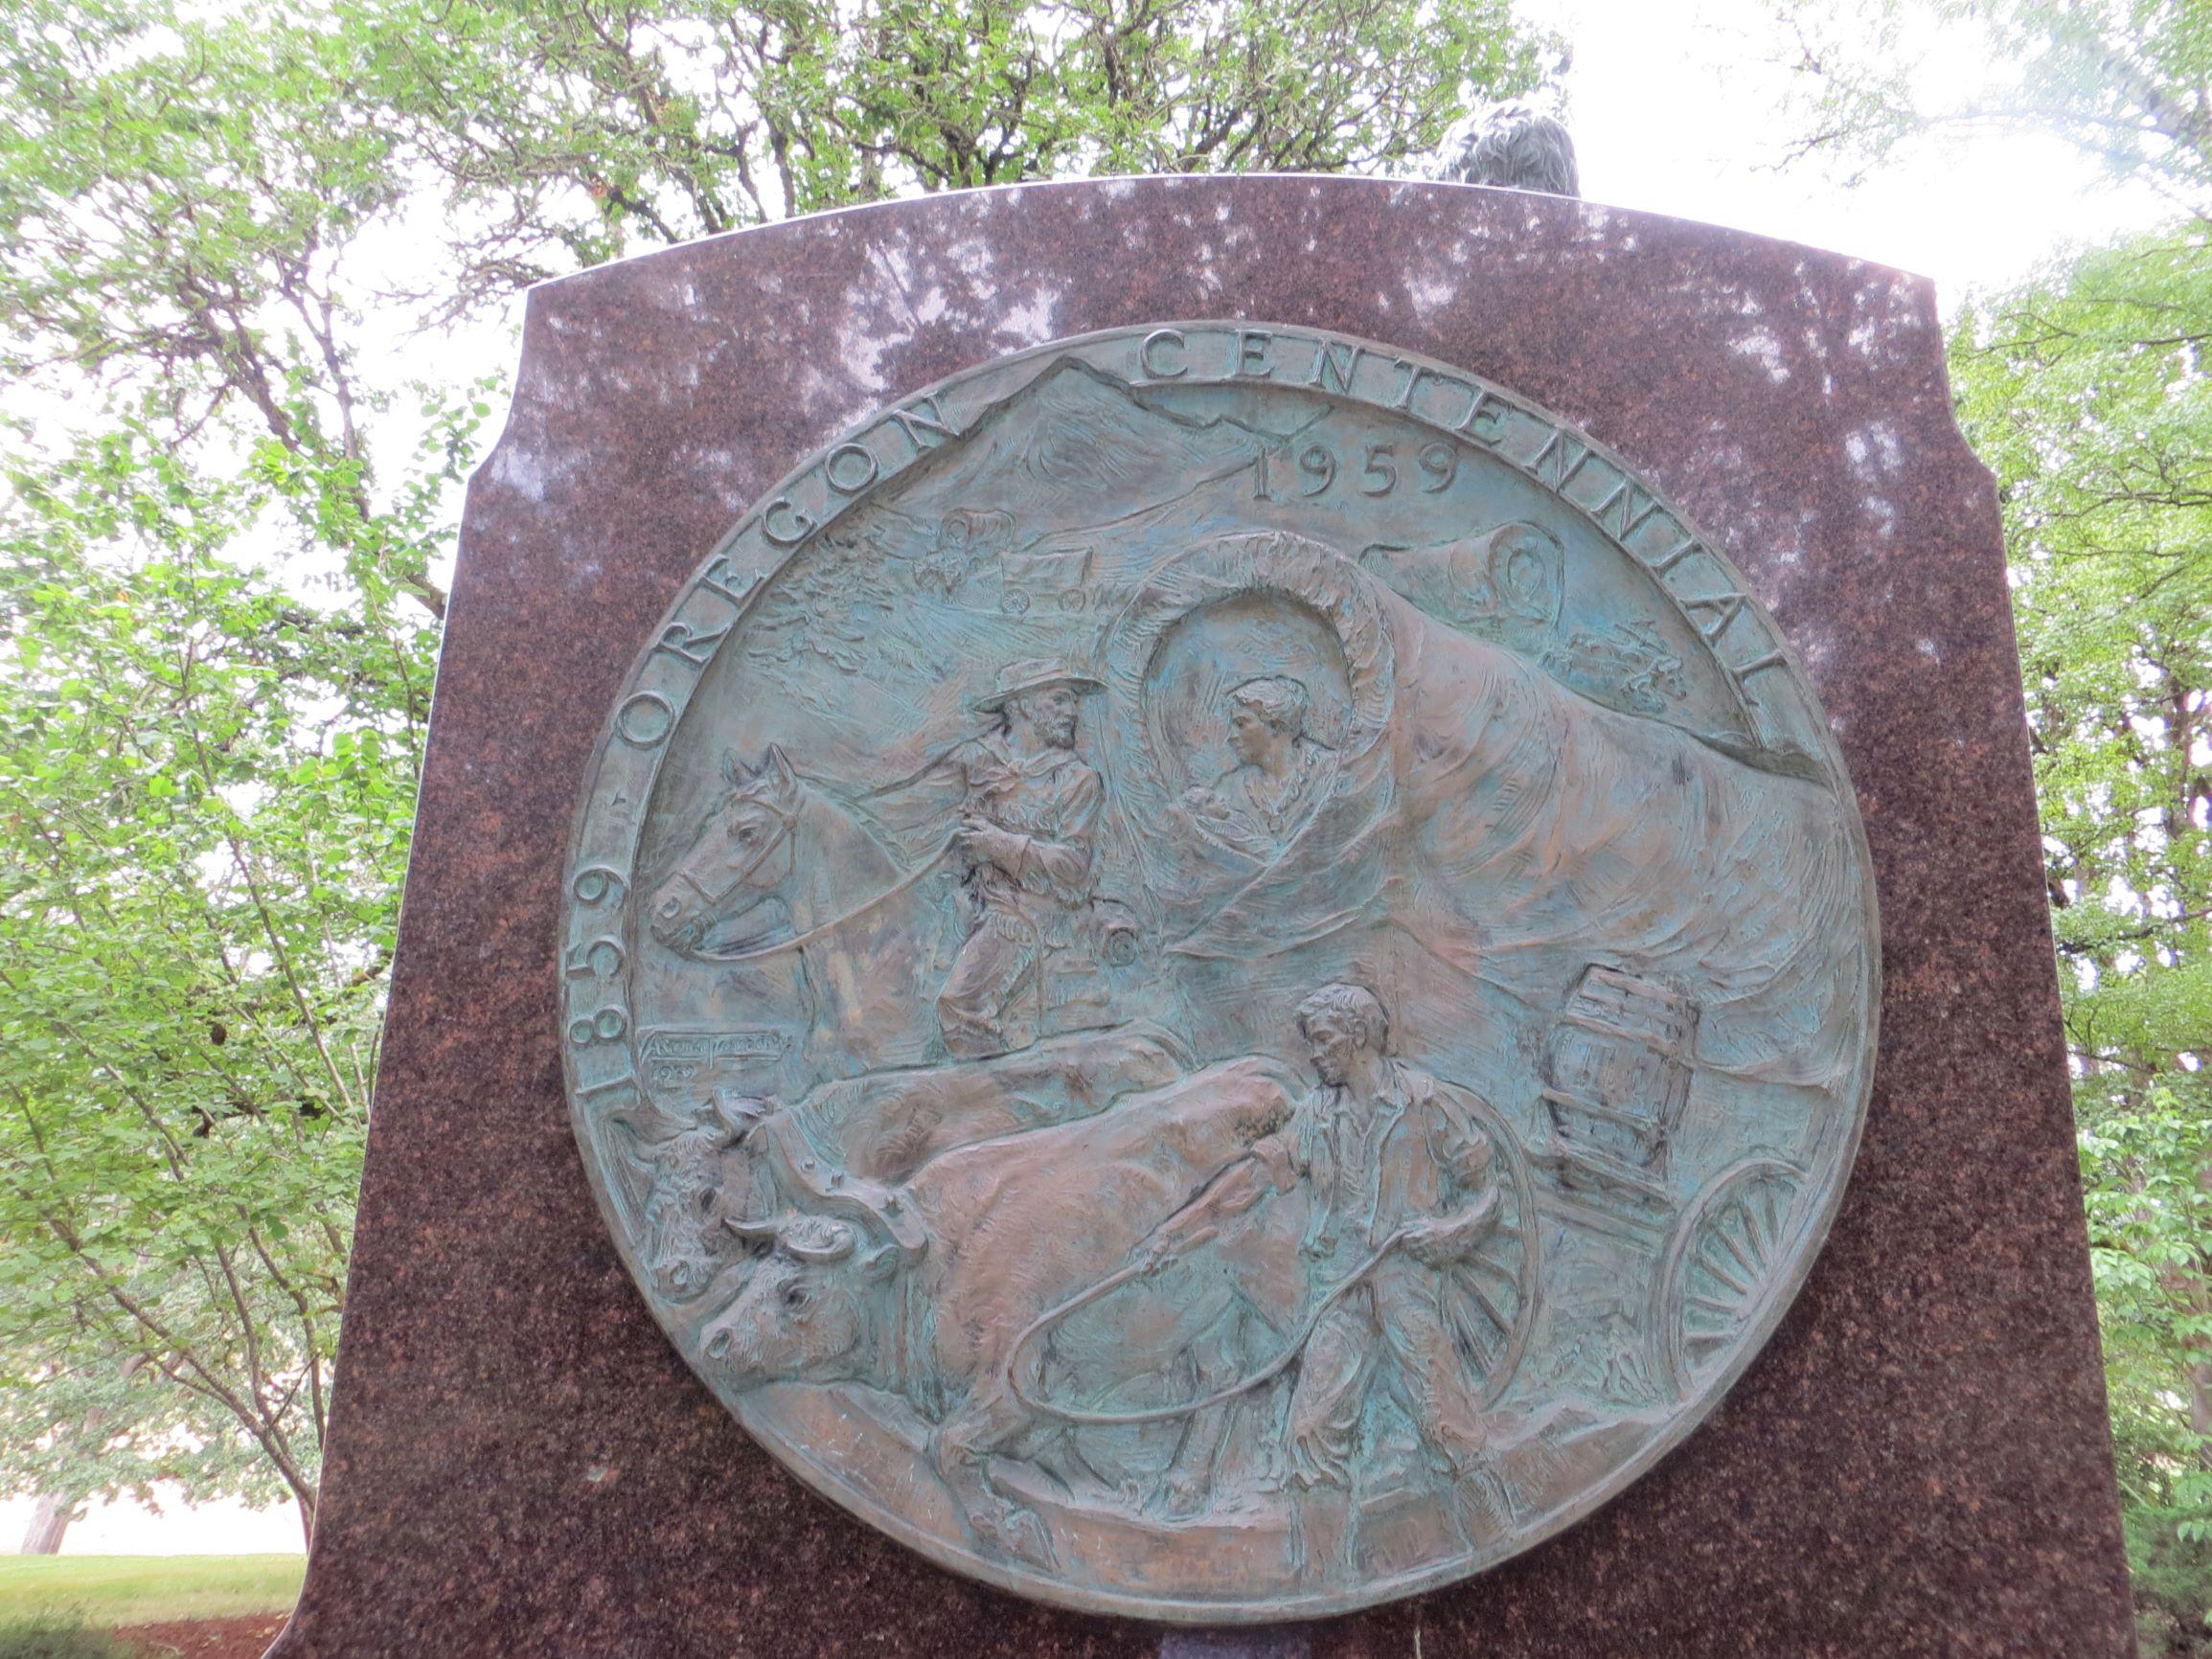 Oregon Centennial medallion on reverse of monument. Photo by Cynthia Prescott.